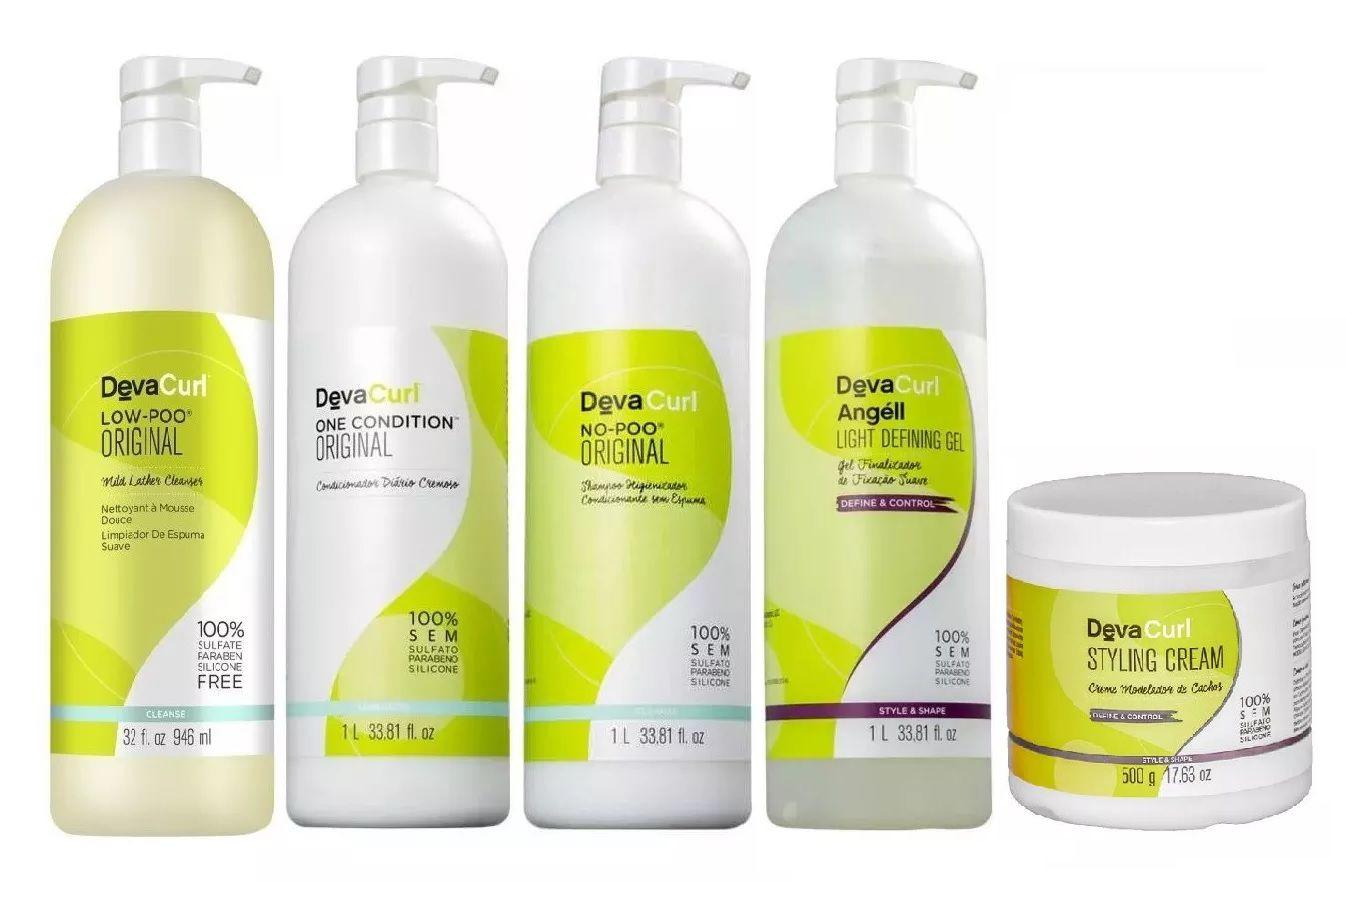 Kit Deva Curl Profissional (5 produtos)